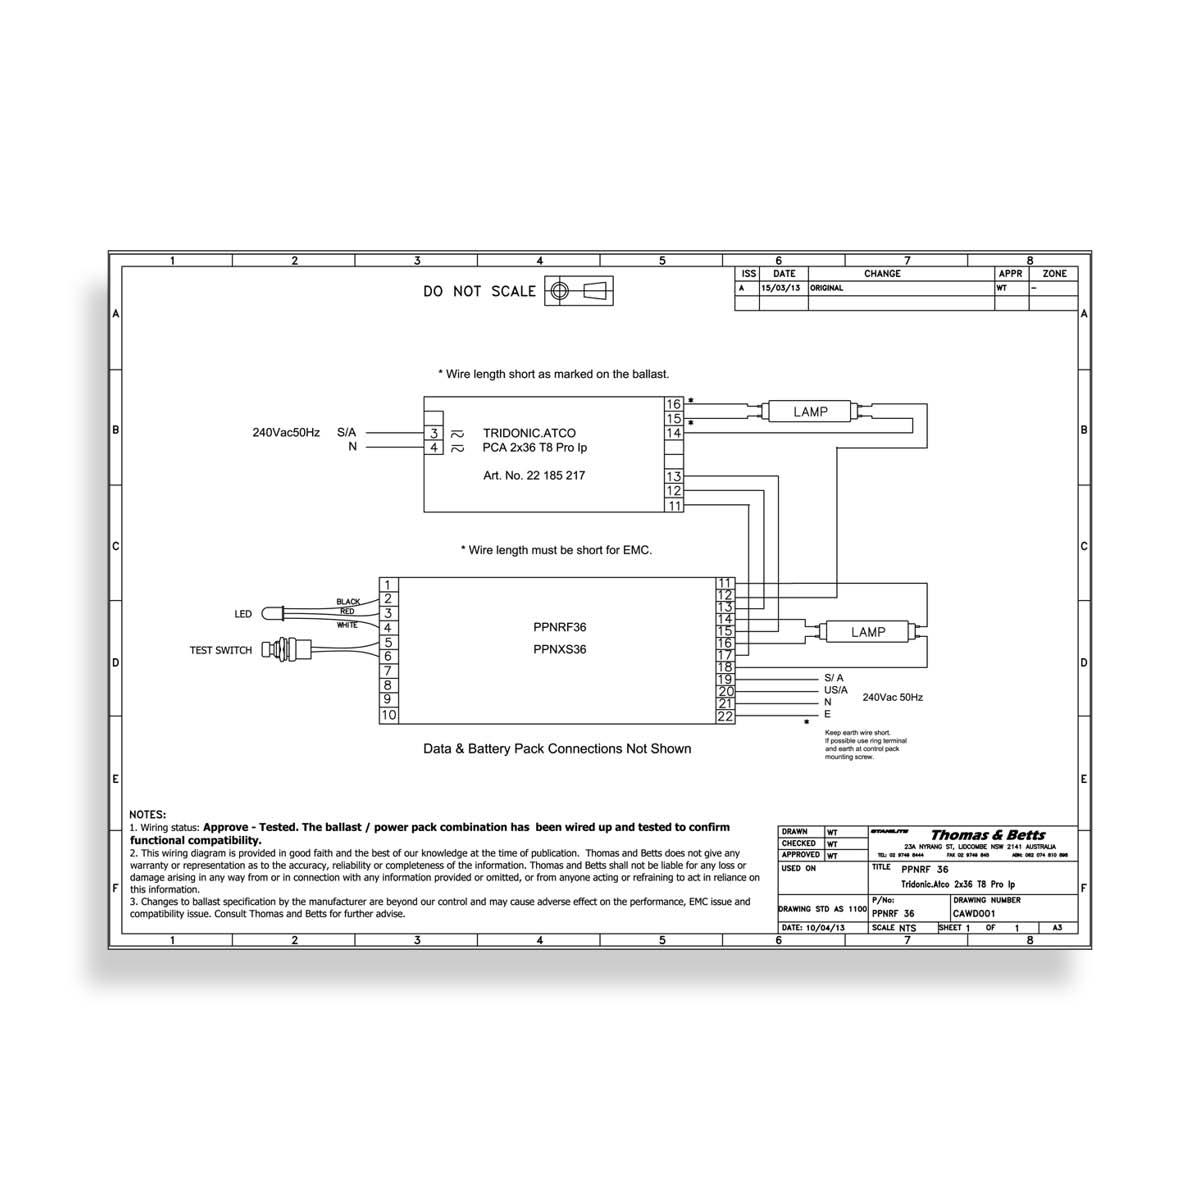 resourceswiringdiagram_el4ph?wid=618&hei=300 thomas & betts australasia resources end user tools wiring vossloh schwabe ballast wiring diagram at pacquiaovsvargaslive.co